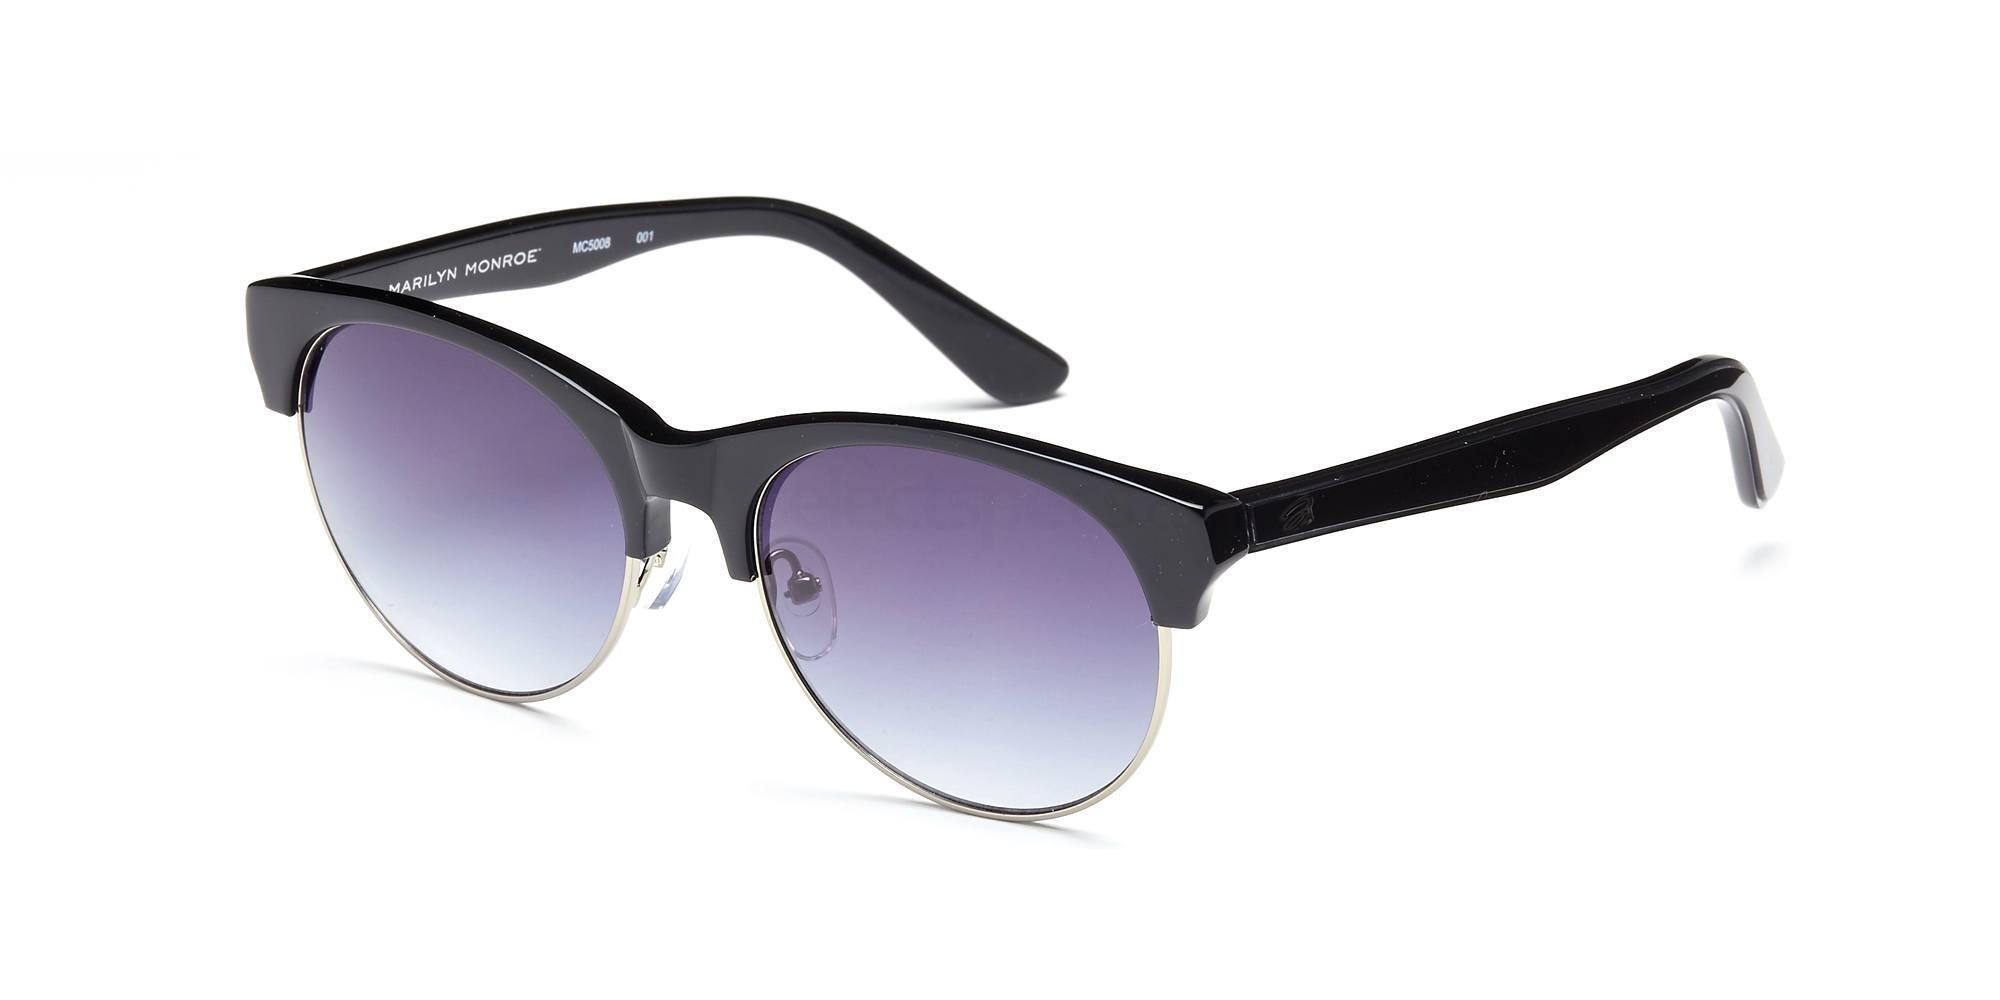 C1 MMS5008 Sunglasses, Marilyn Monroe